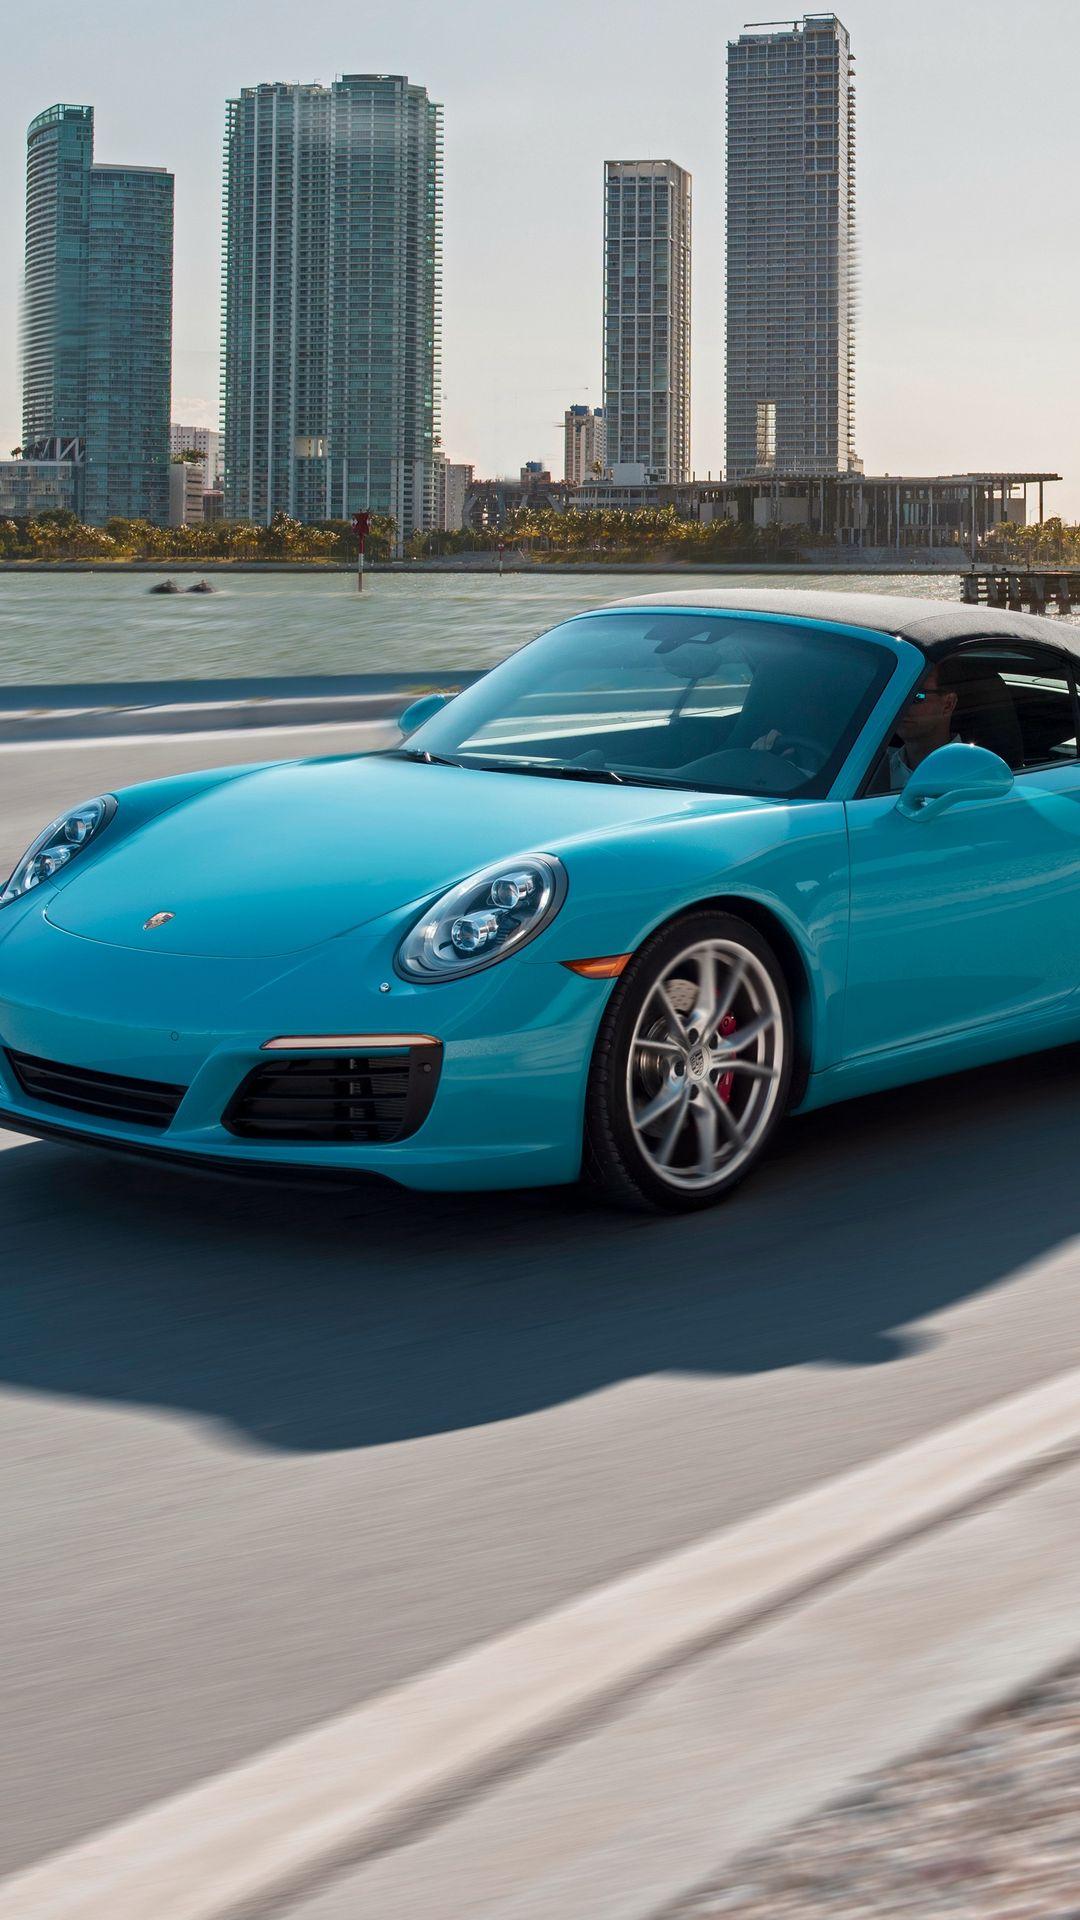 Porsche Carrera Blue Series Wallpapers Free Download